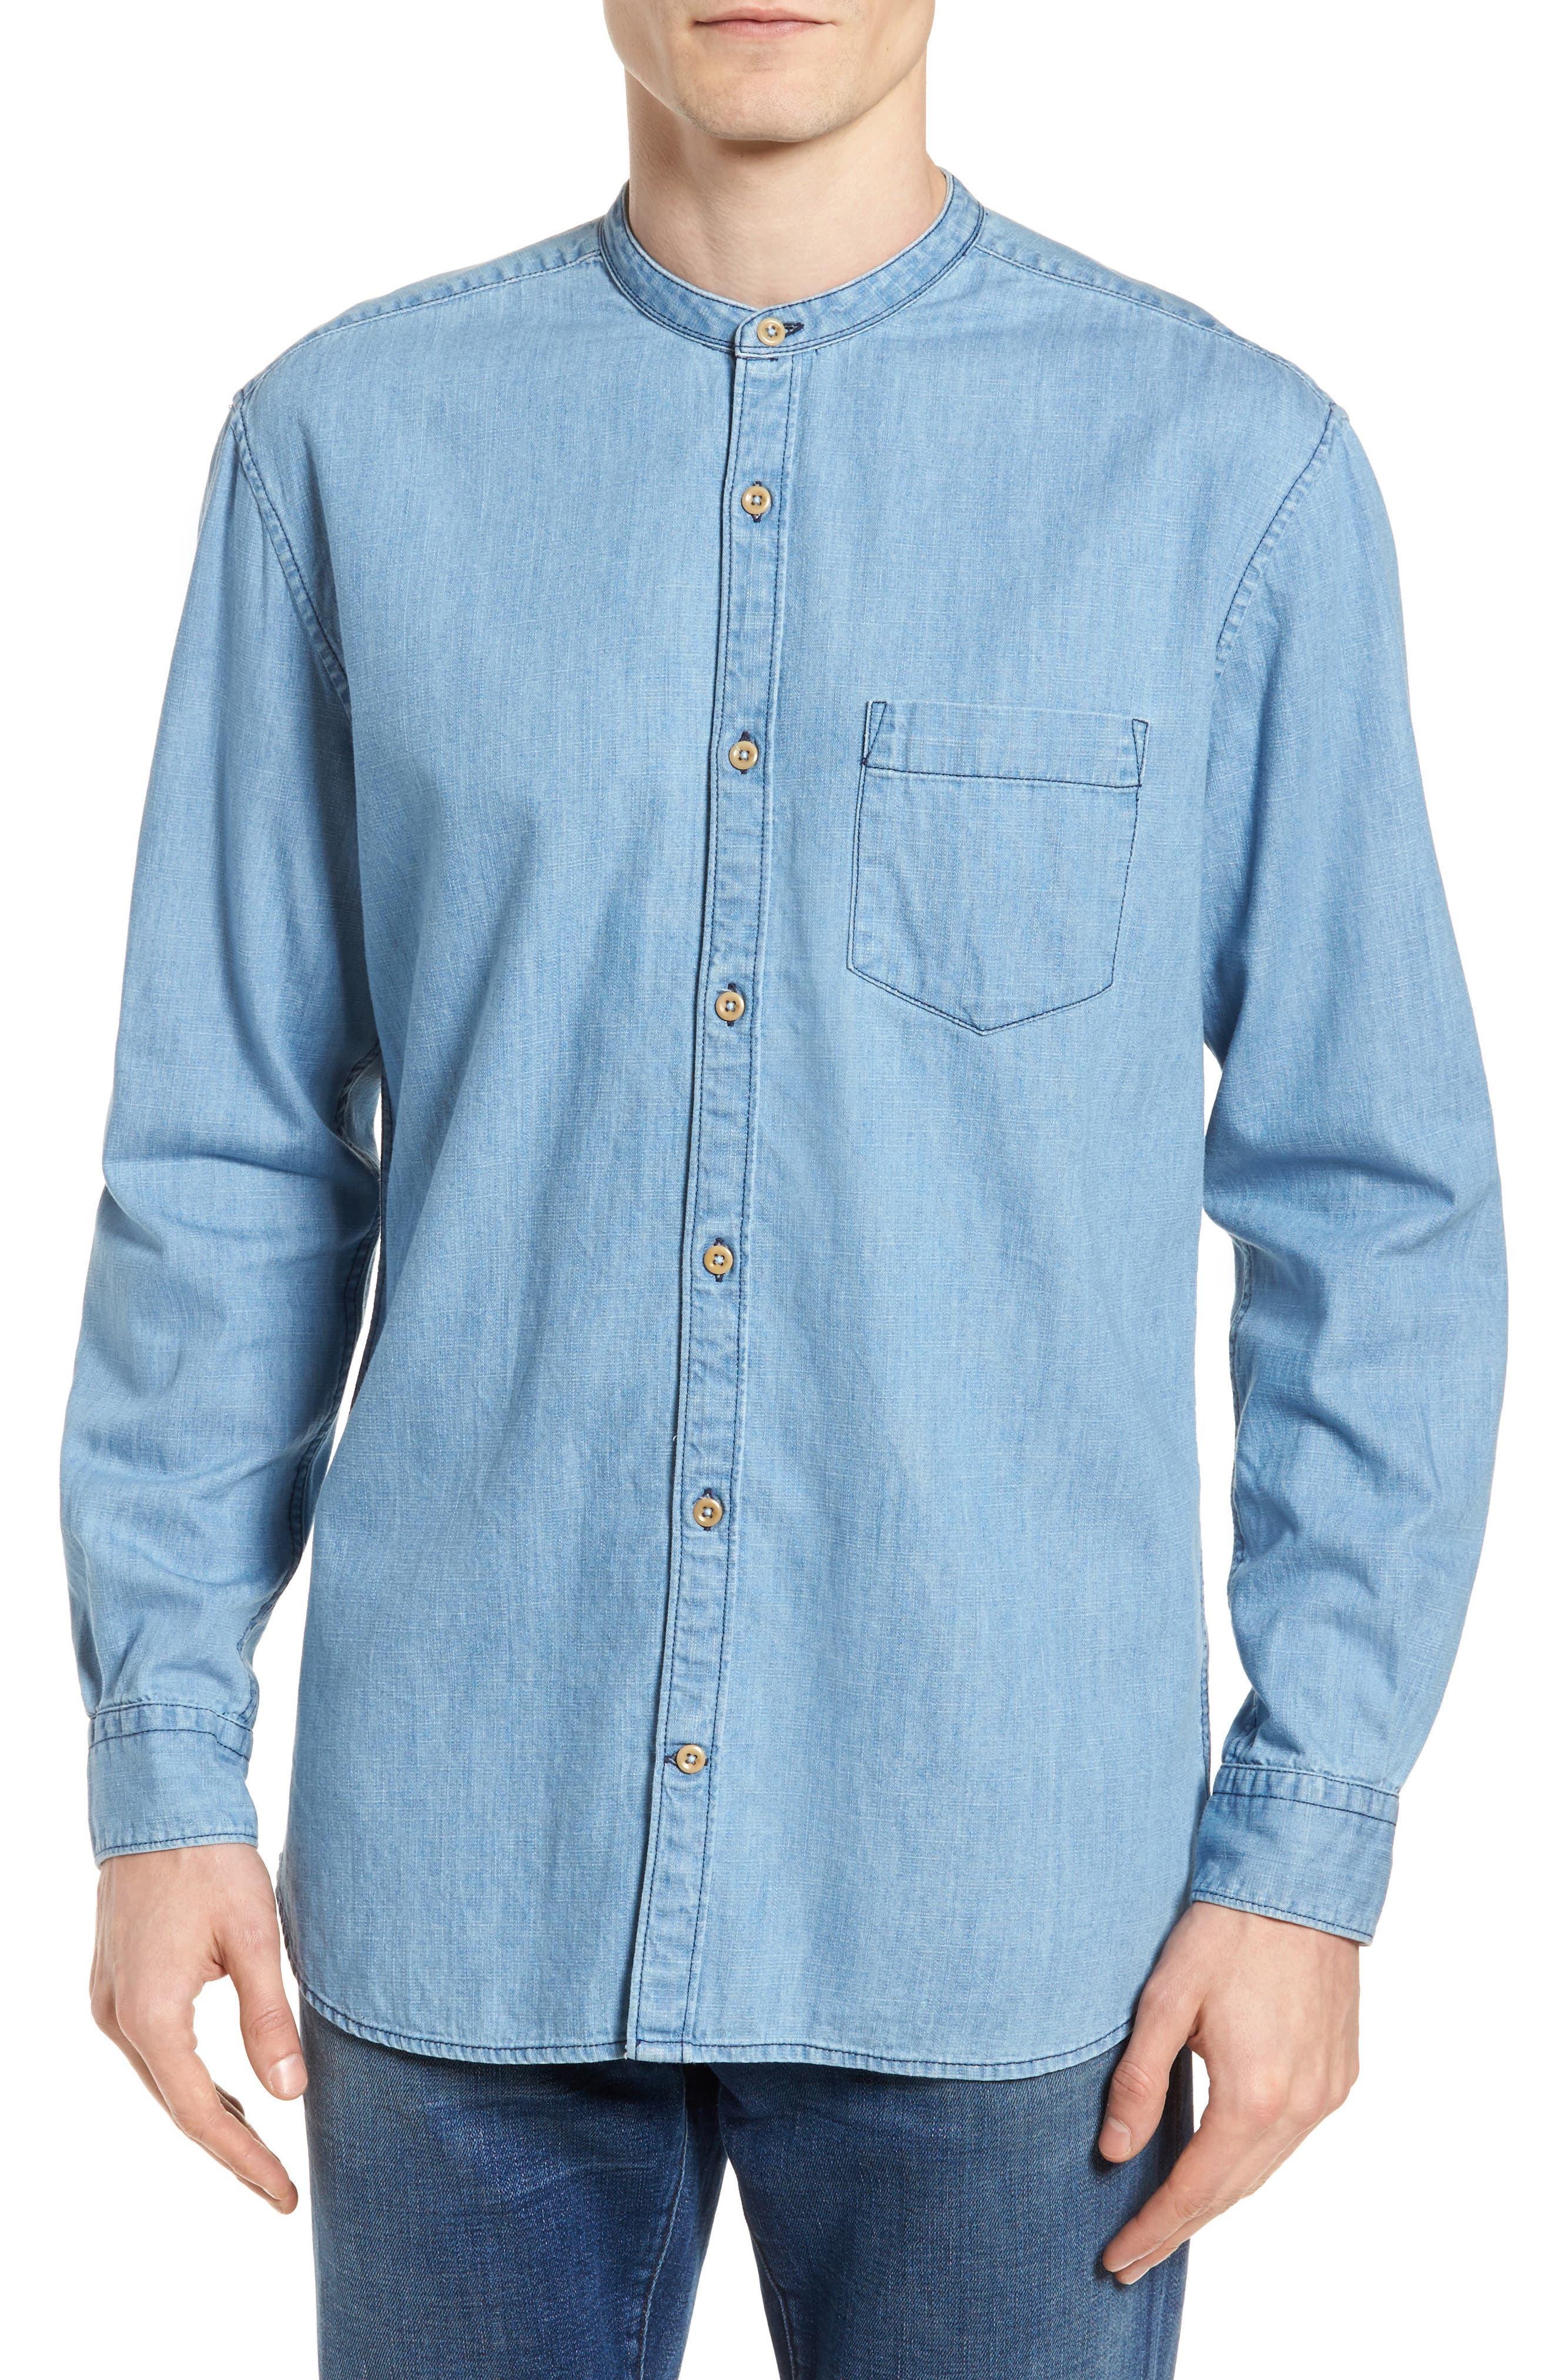 Core Denim Regular Fit Sport Shirt,                             Main thumbnail 1, color,                             Bleach